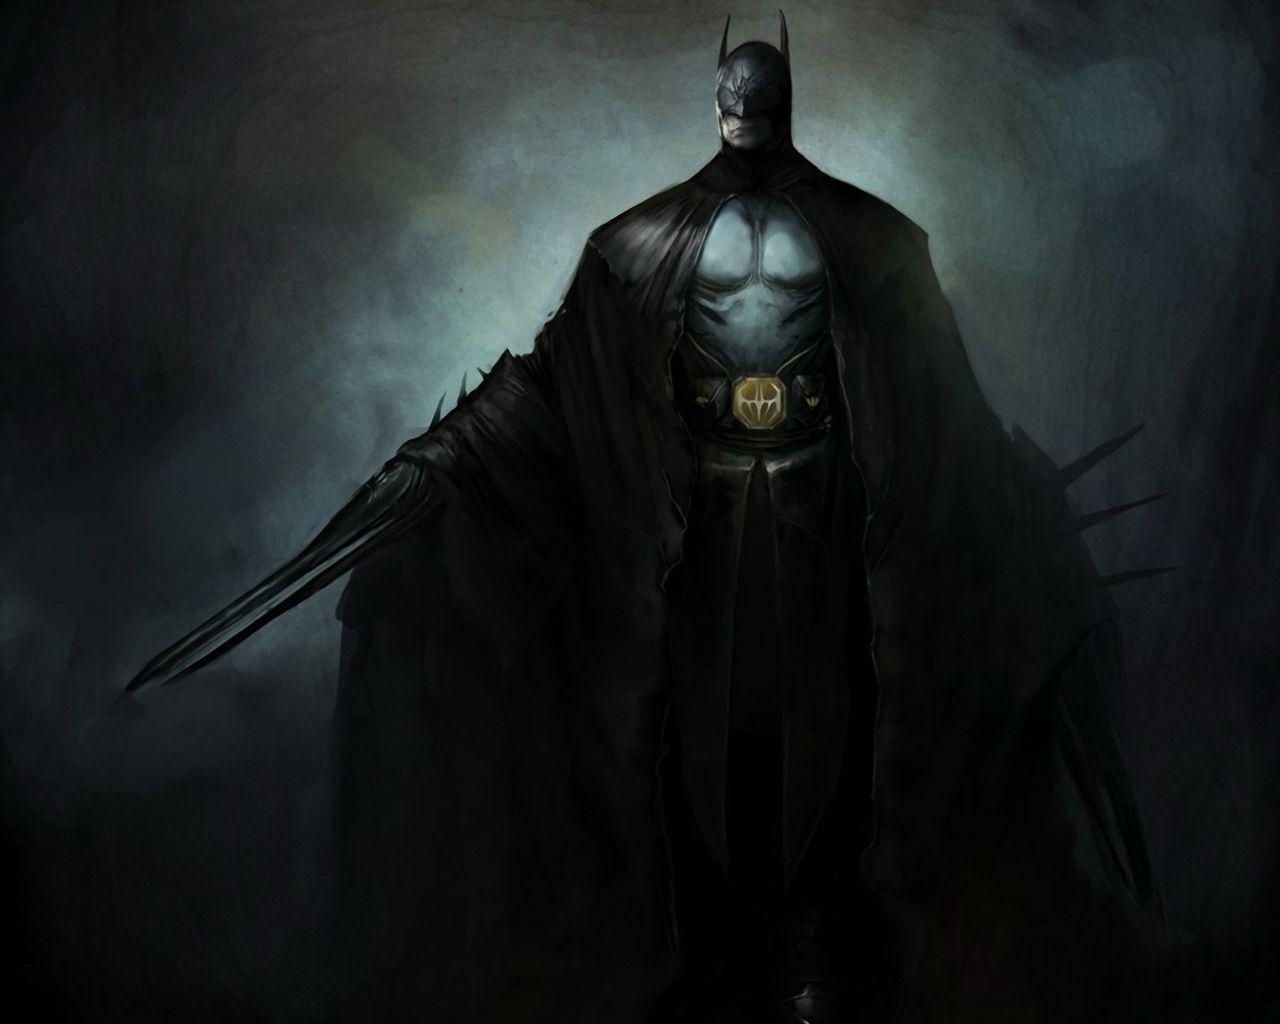 batman wallpapers and screensavers wallpaper cave